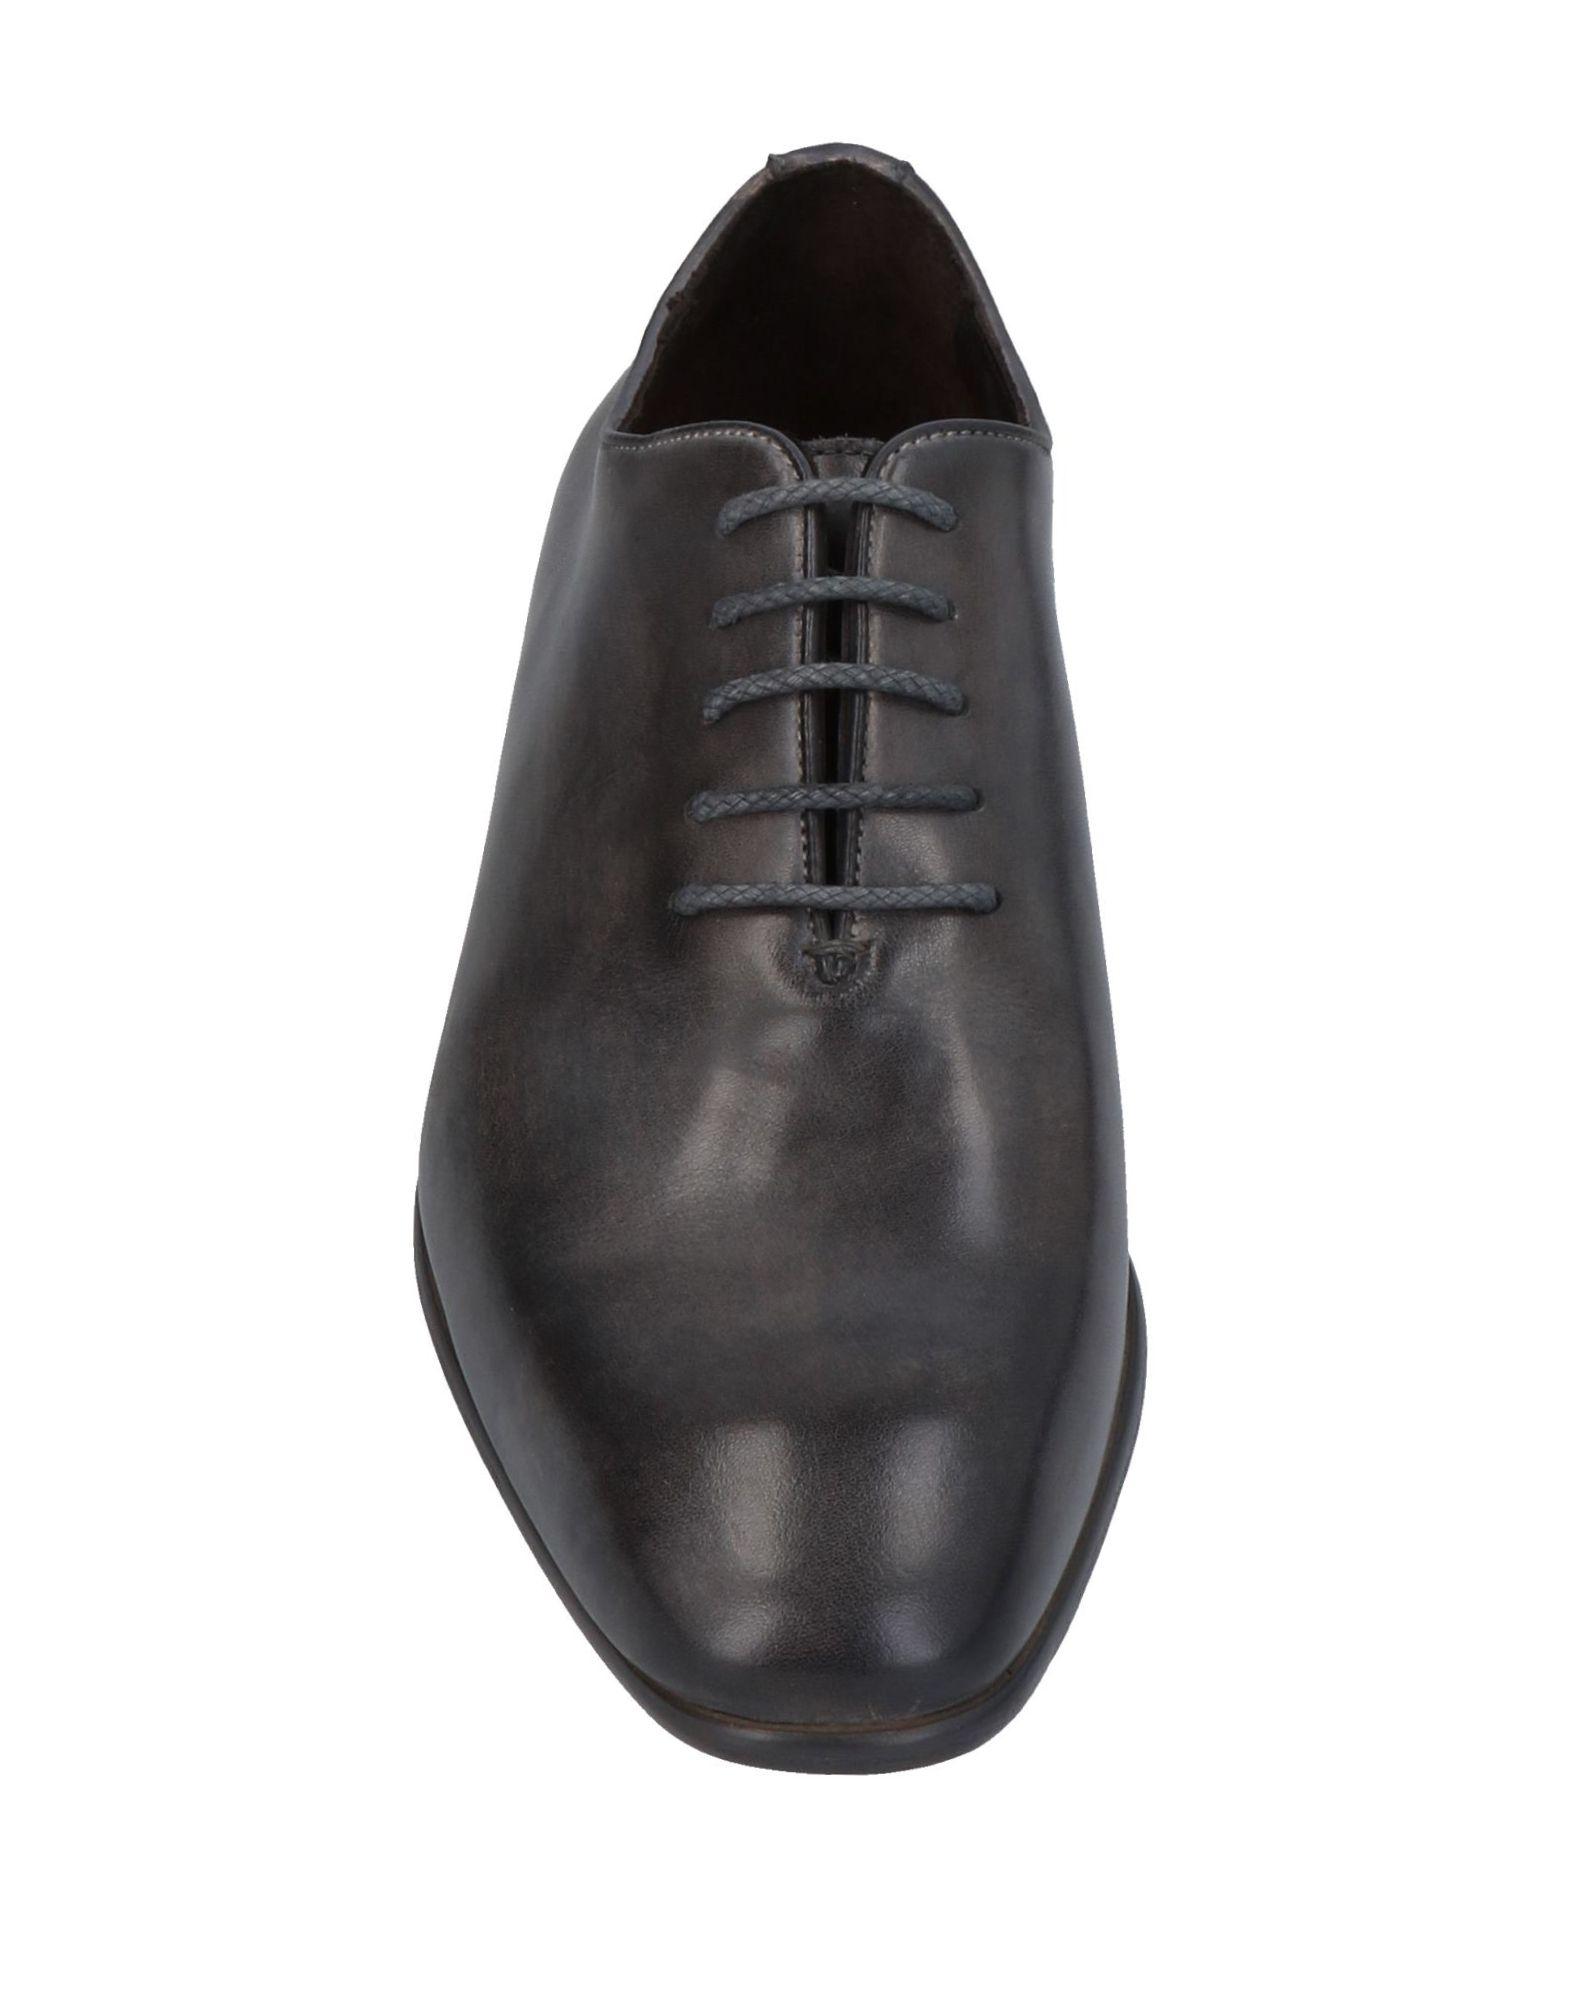 Richard Lars Schnürschuhe Herren Herren Schnürschuhe  11447100CX Neue Schuhe b2203d